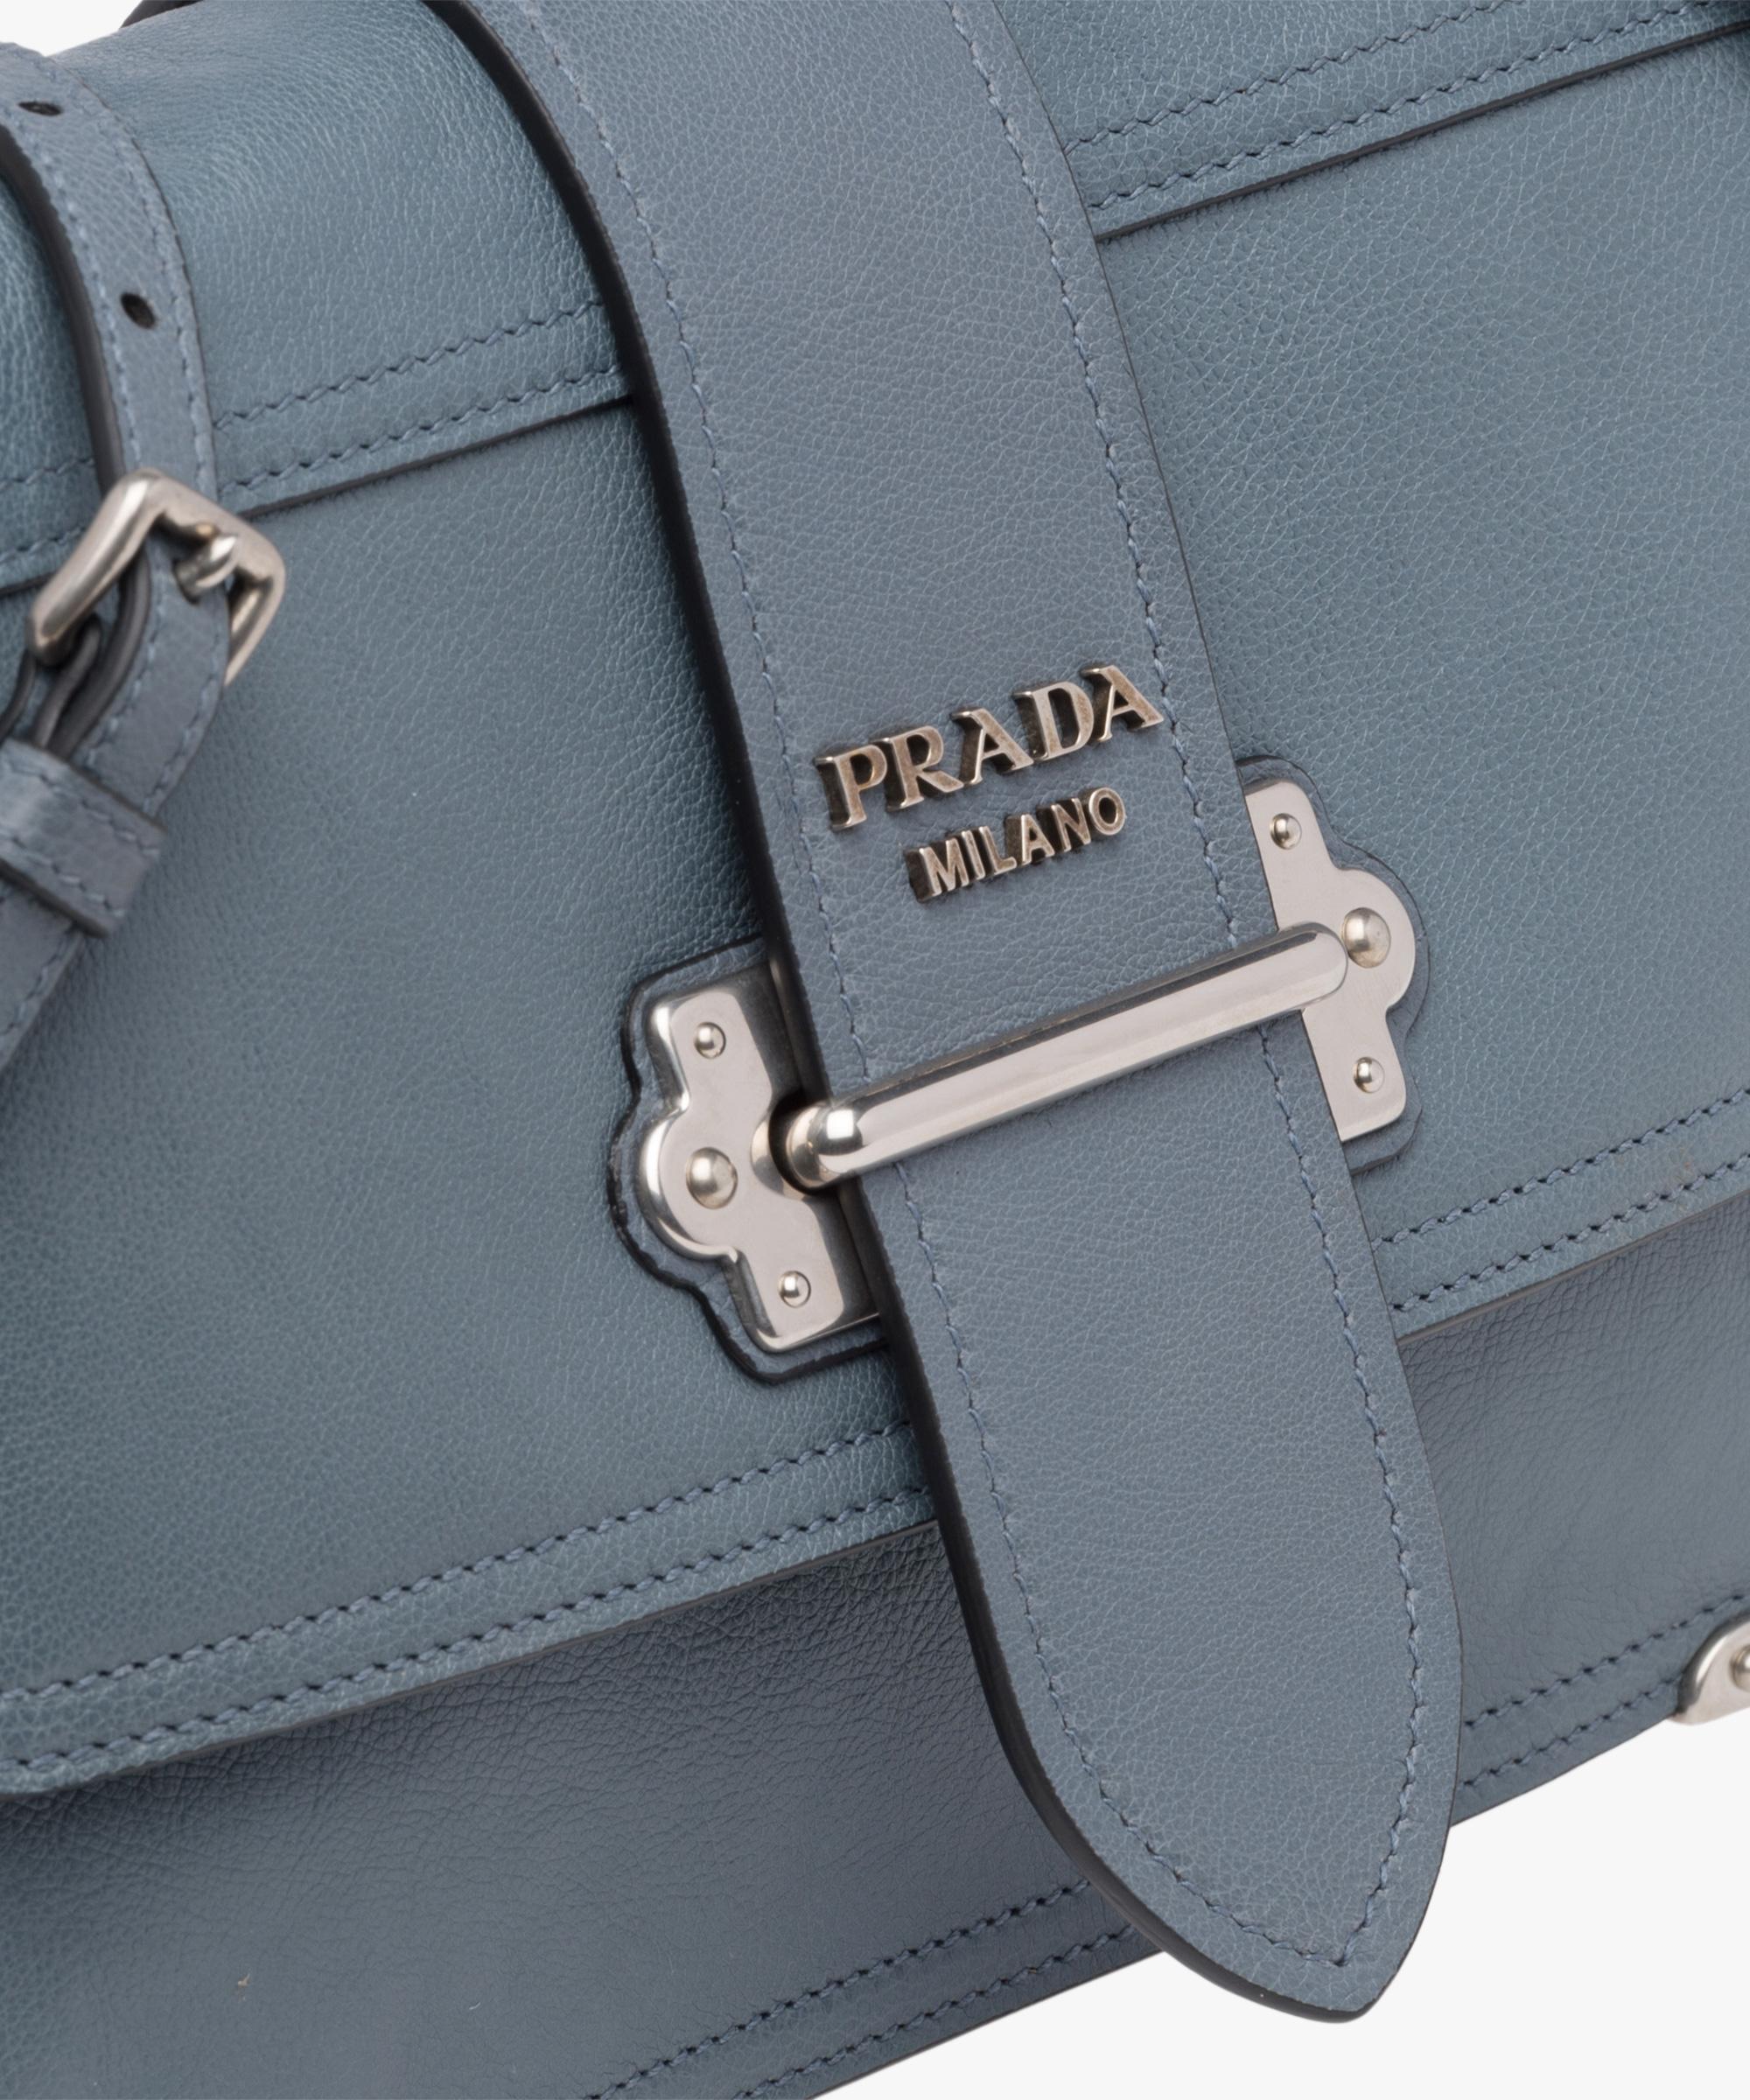 1f7512126d51 ... Prada Cahier leather shoulder bag Prada MARINE BLUE ASTRAL BLUE 1 ...